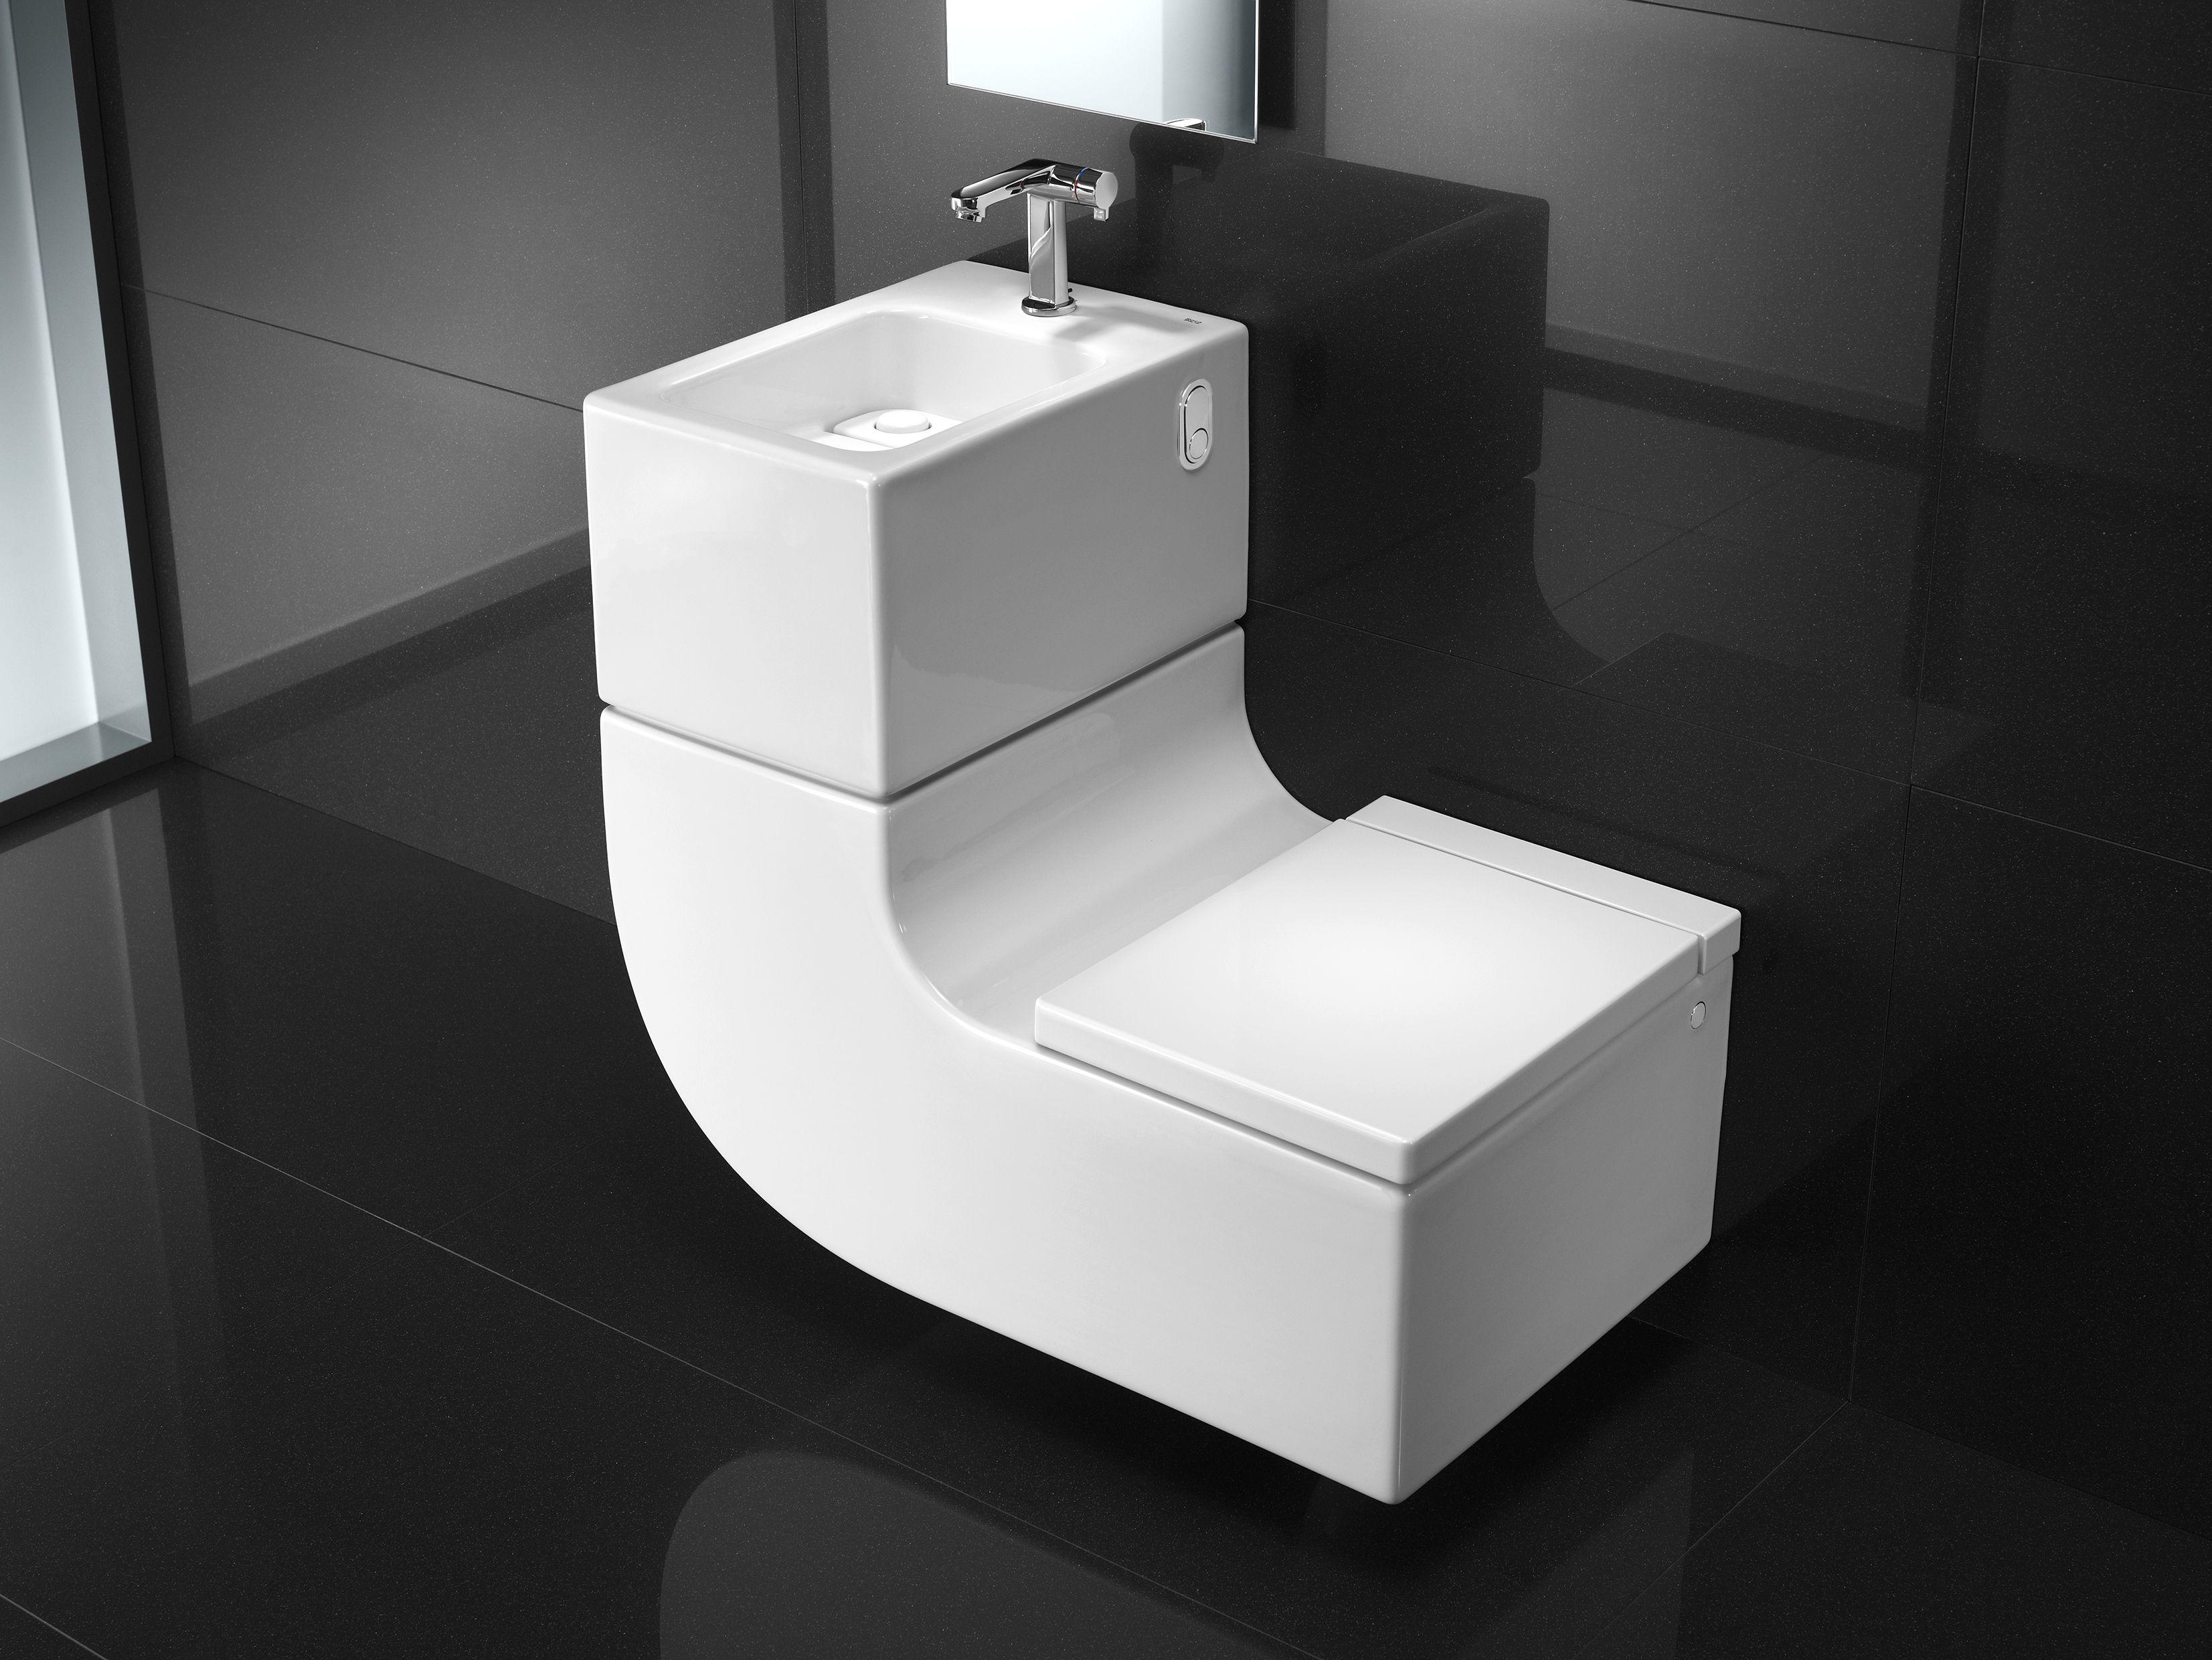 Roca W W Toilet Wc Suspendu Petite Salle De Toilette Cuvette Wc Suspendu